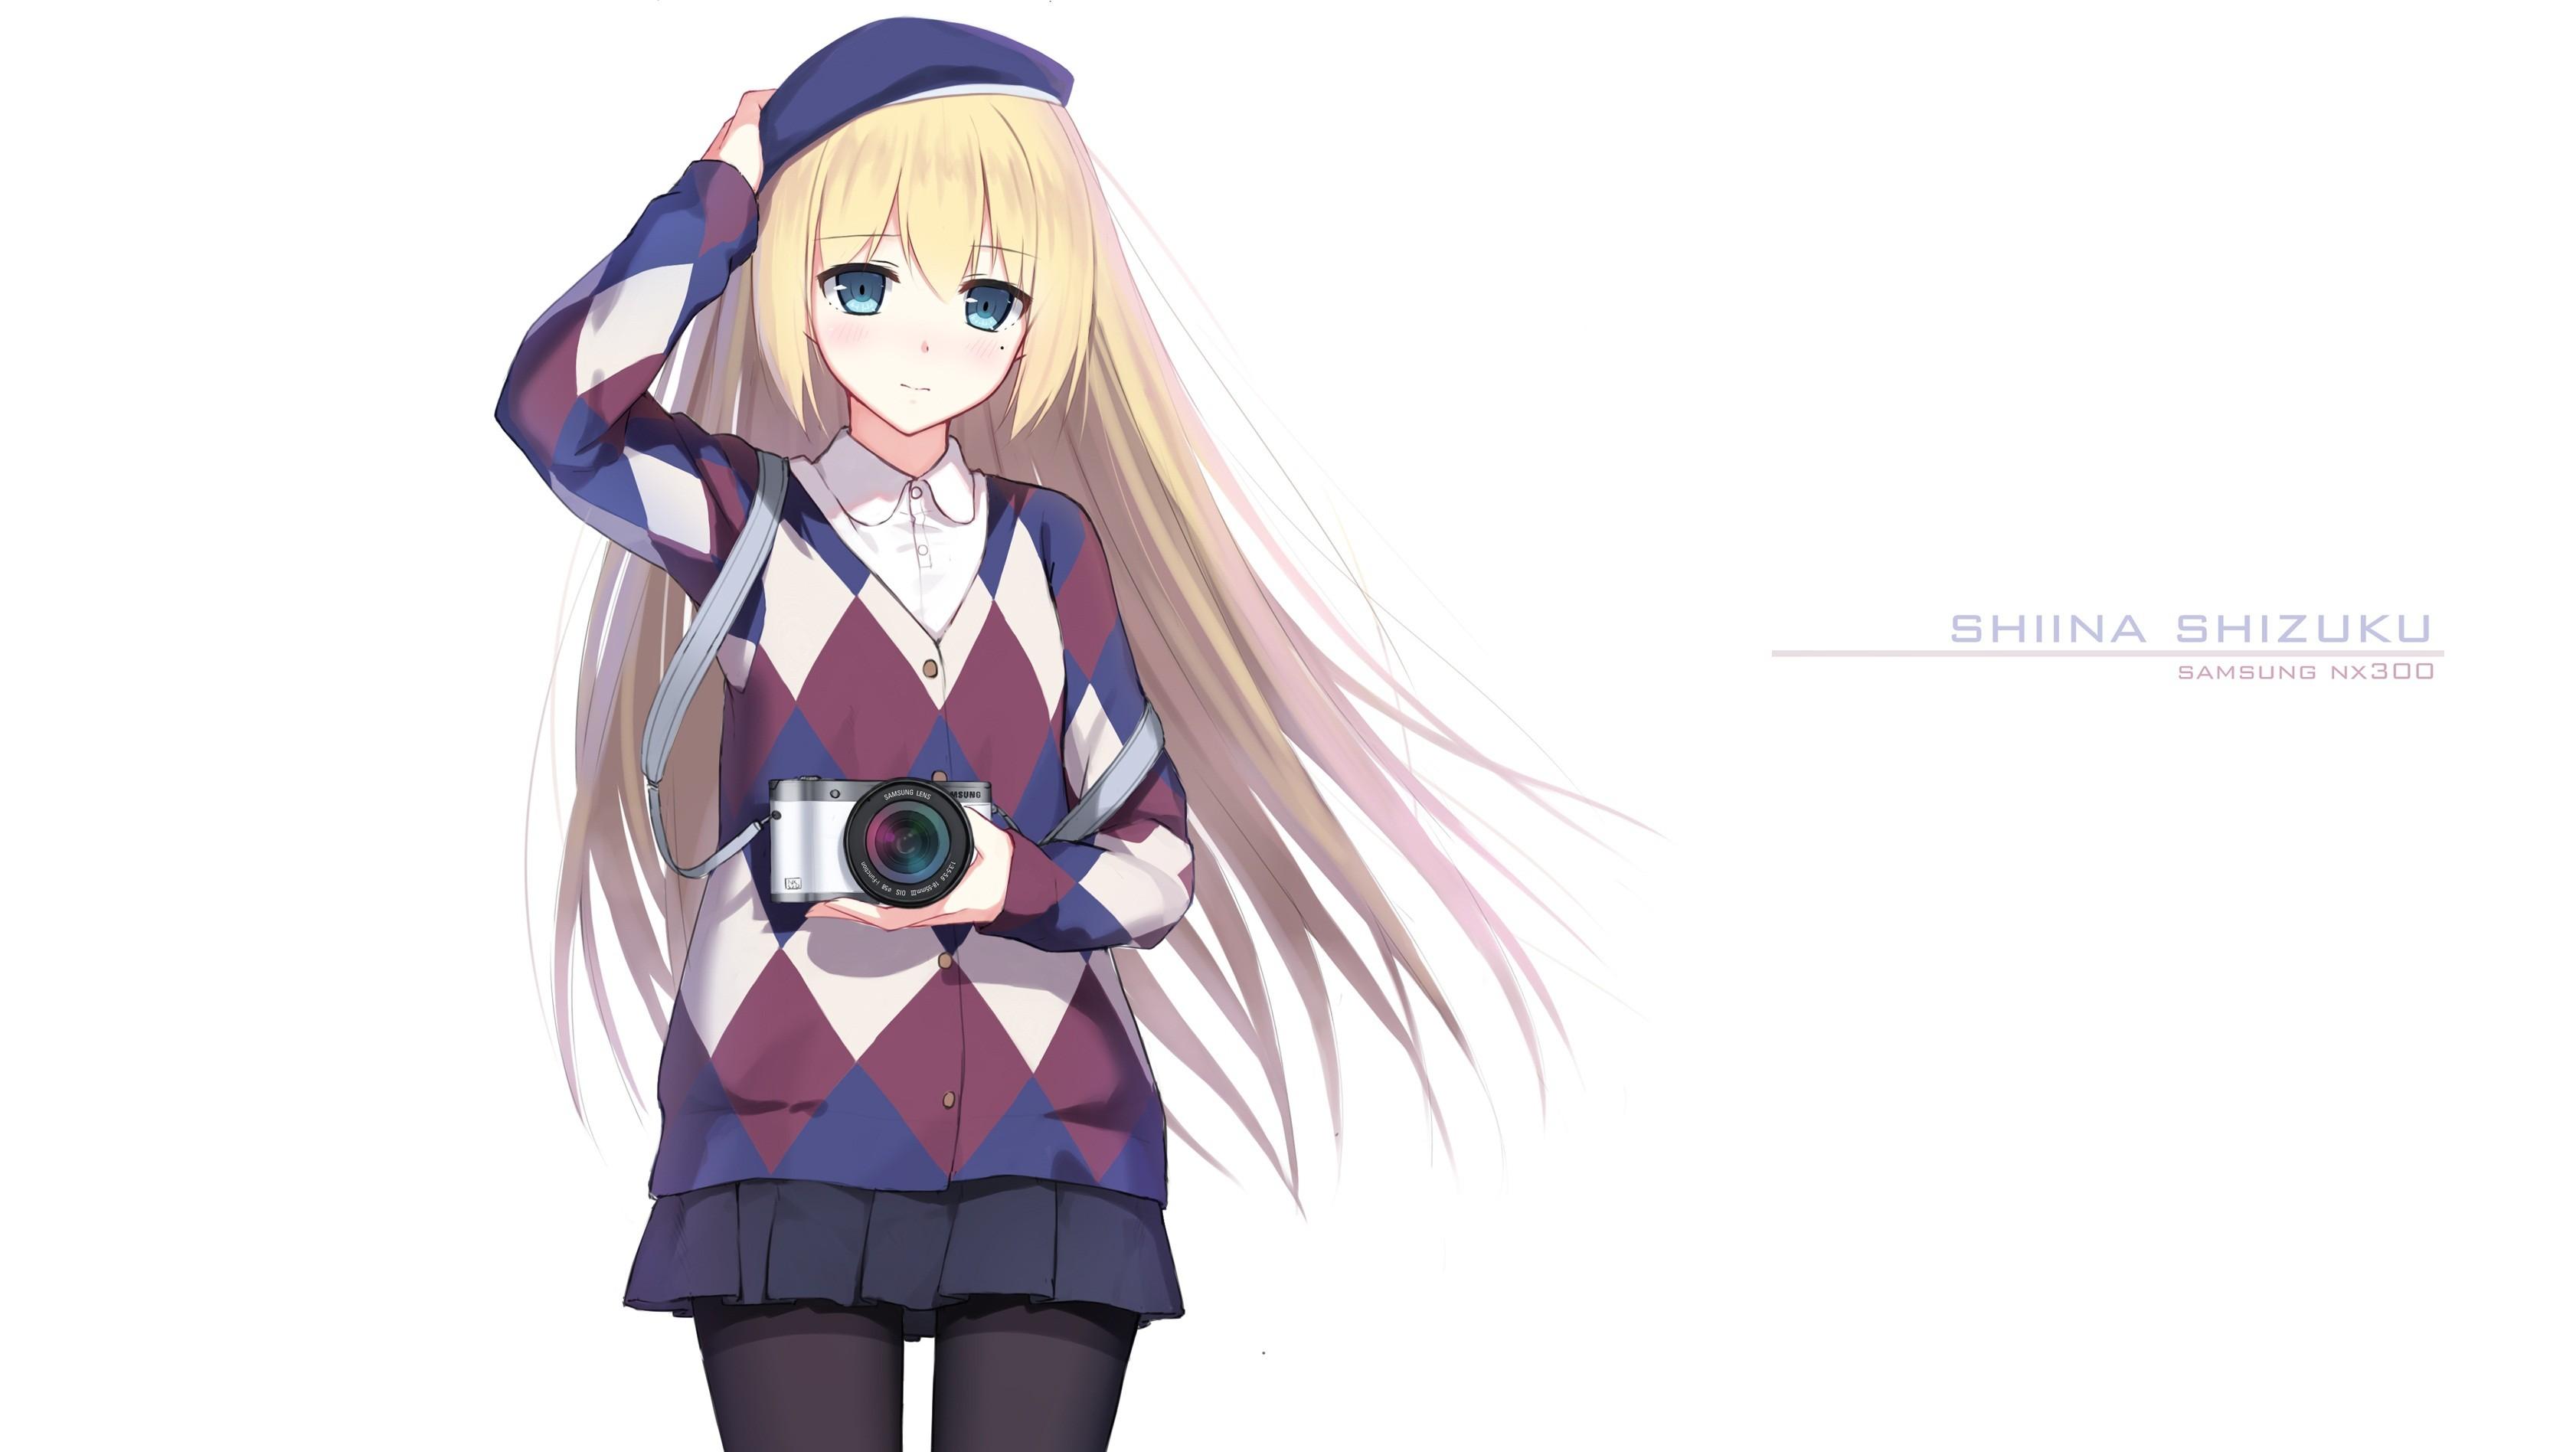 Wallpaper Illustration Blonde Anime Girls Shiina Shizuku Camera Samsung Cartoon Costume Sketch Mangaka 3364x1896 Kejsirajbek 386 Hd Wallpapers Wallhere